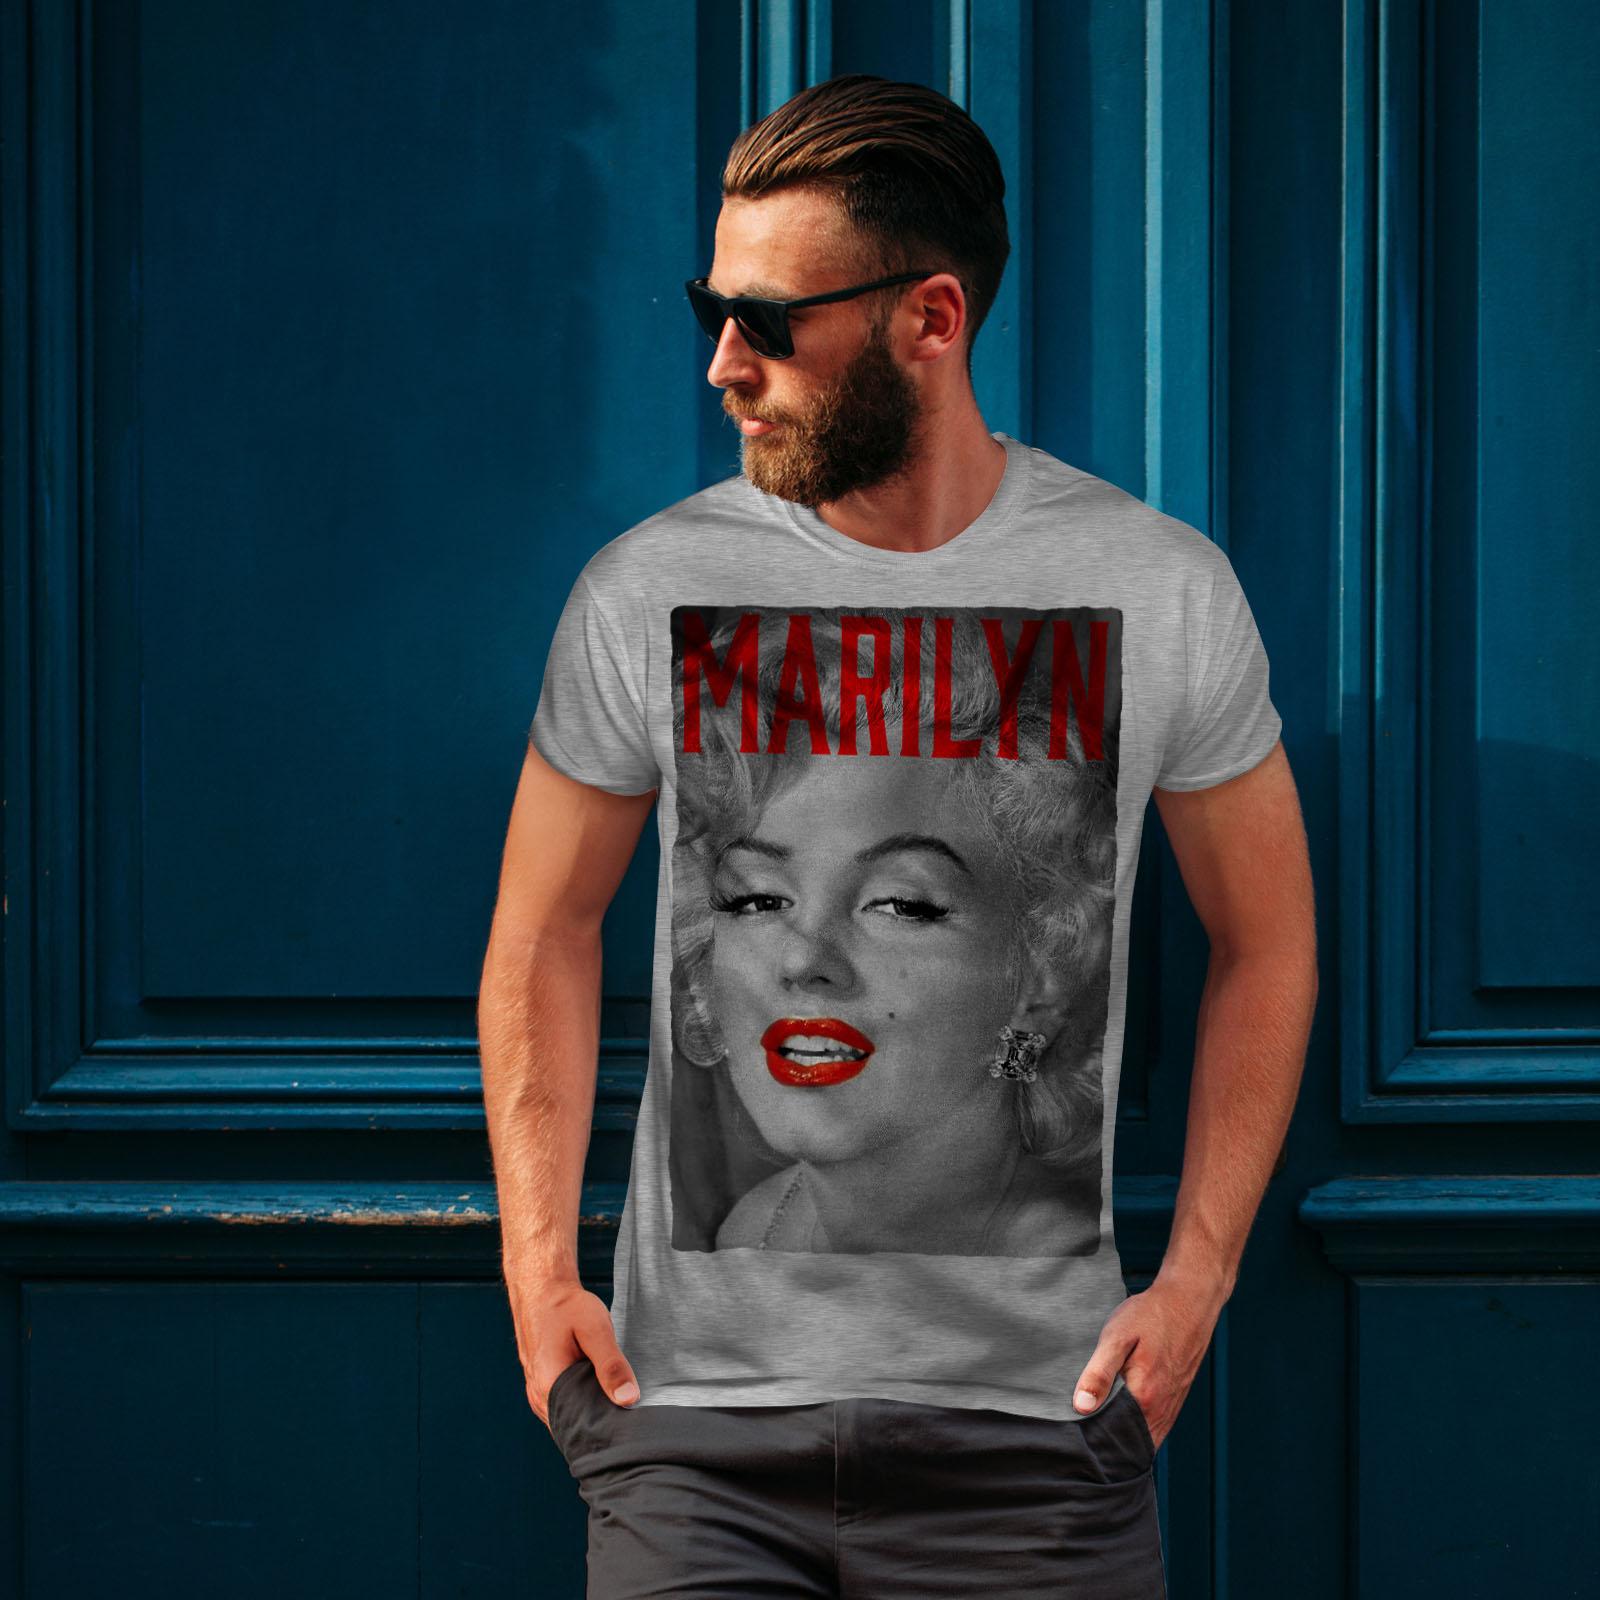 Wellcoda-Marilyn-Retro-Photo-Mens-T-shirt-Urban-Graphic-Design-Printed-Tee thumbnail 16